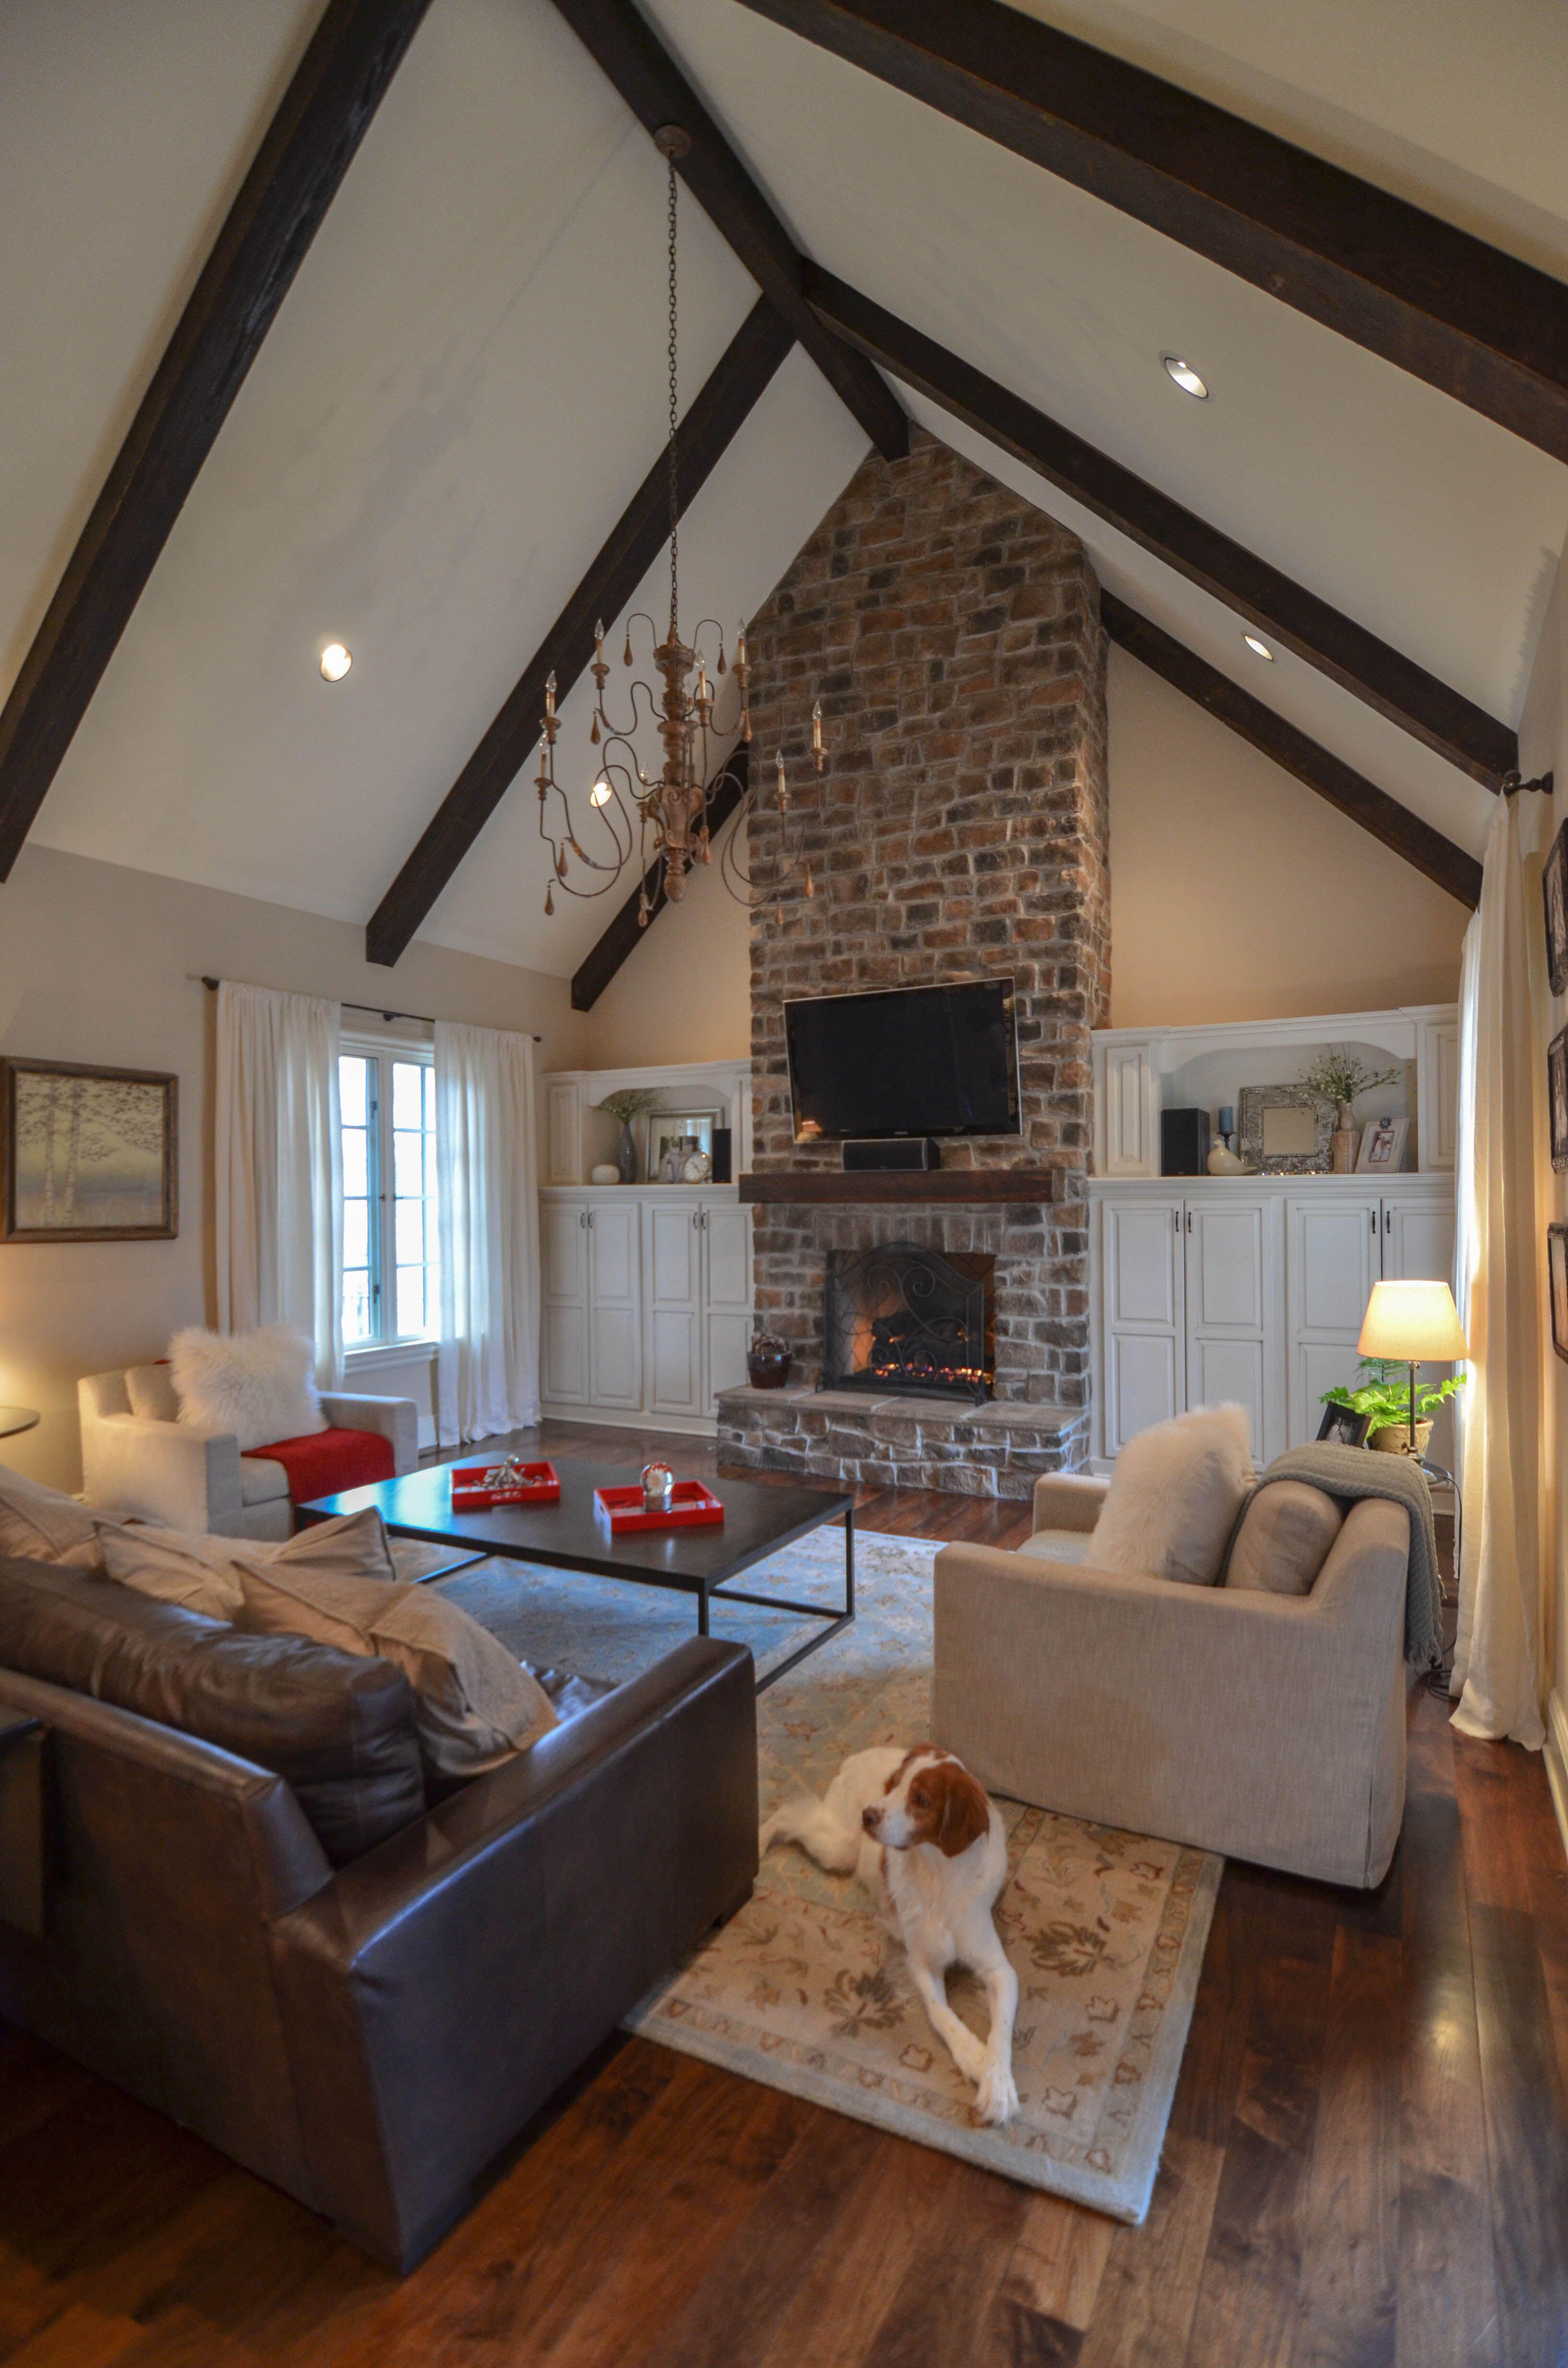 Kitchen Great Room Designs: Interior Design Photograph By Adrienne Figueroa